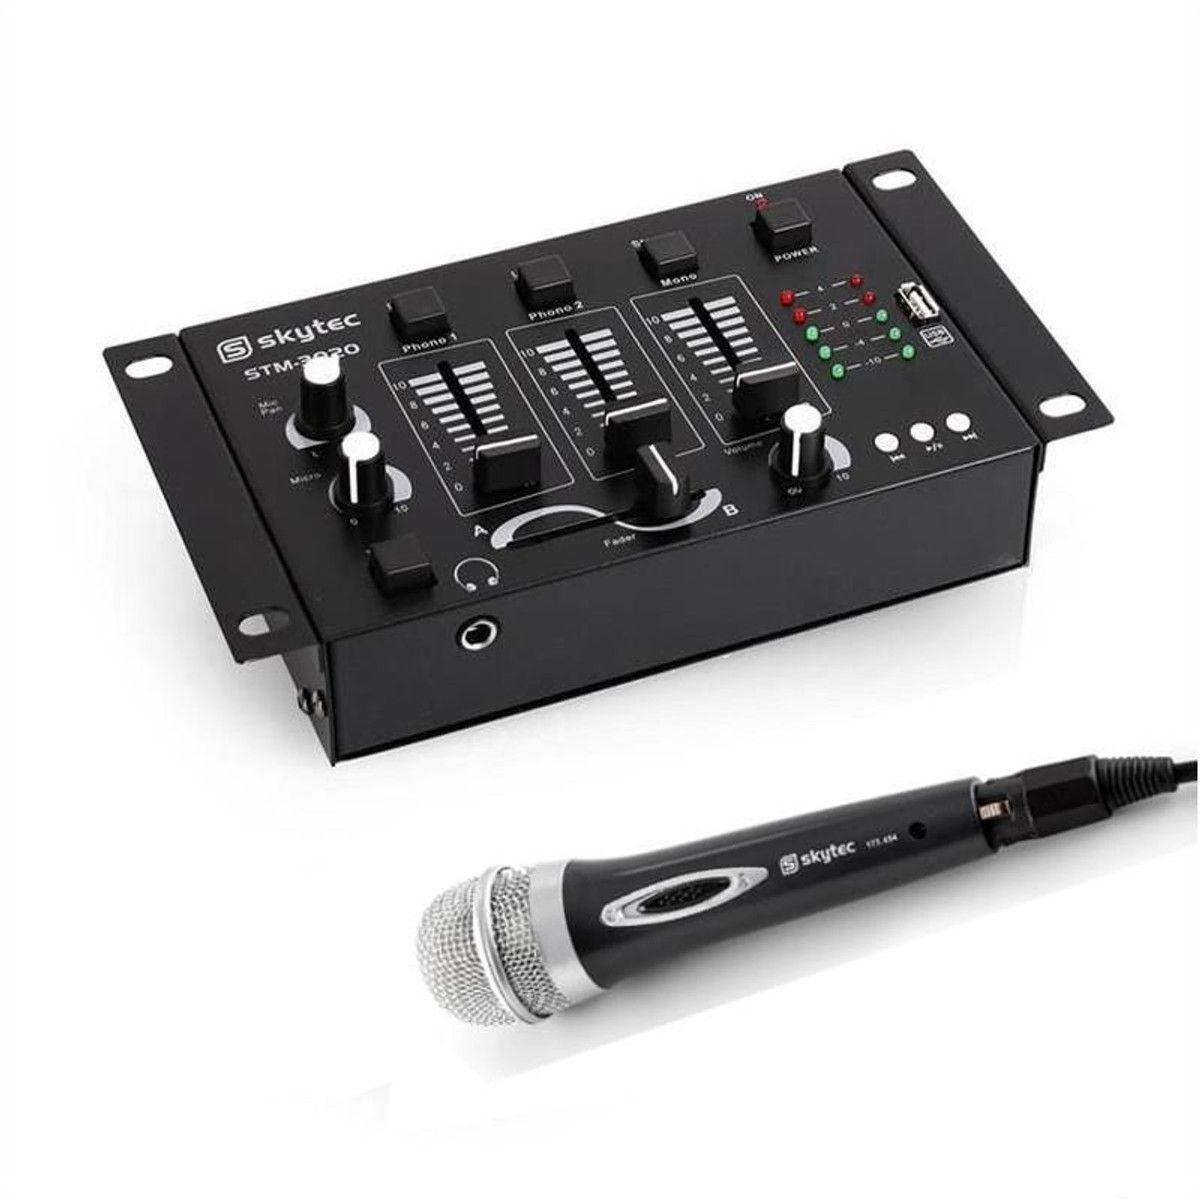 Skytec Mini Dj Set Mixer 2 3 Canaux Micro Dynamique Canaux Mini Et Usb